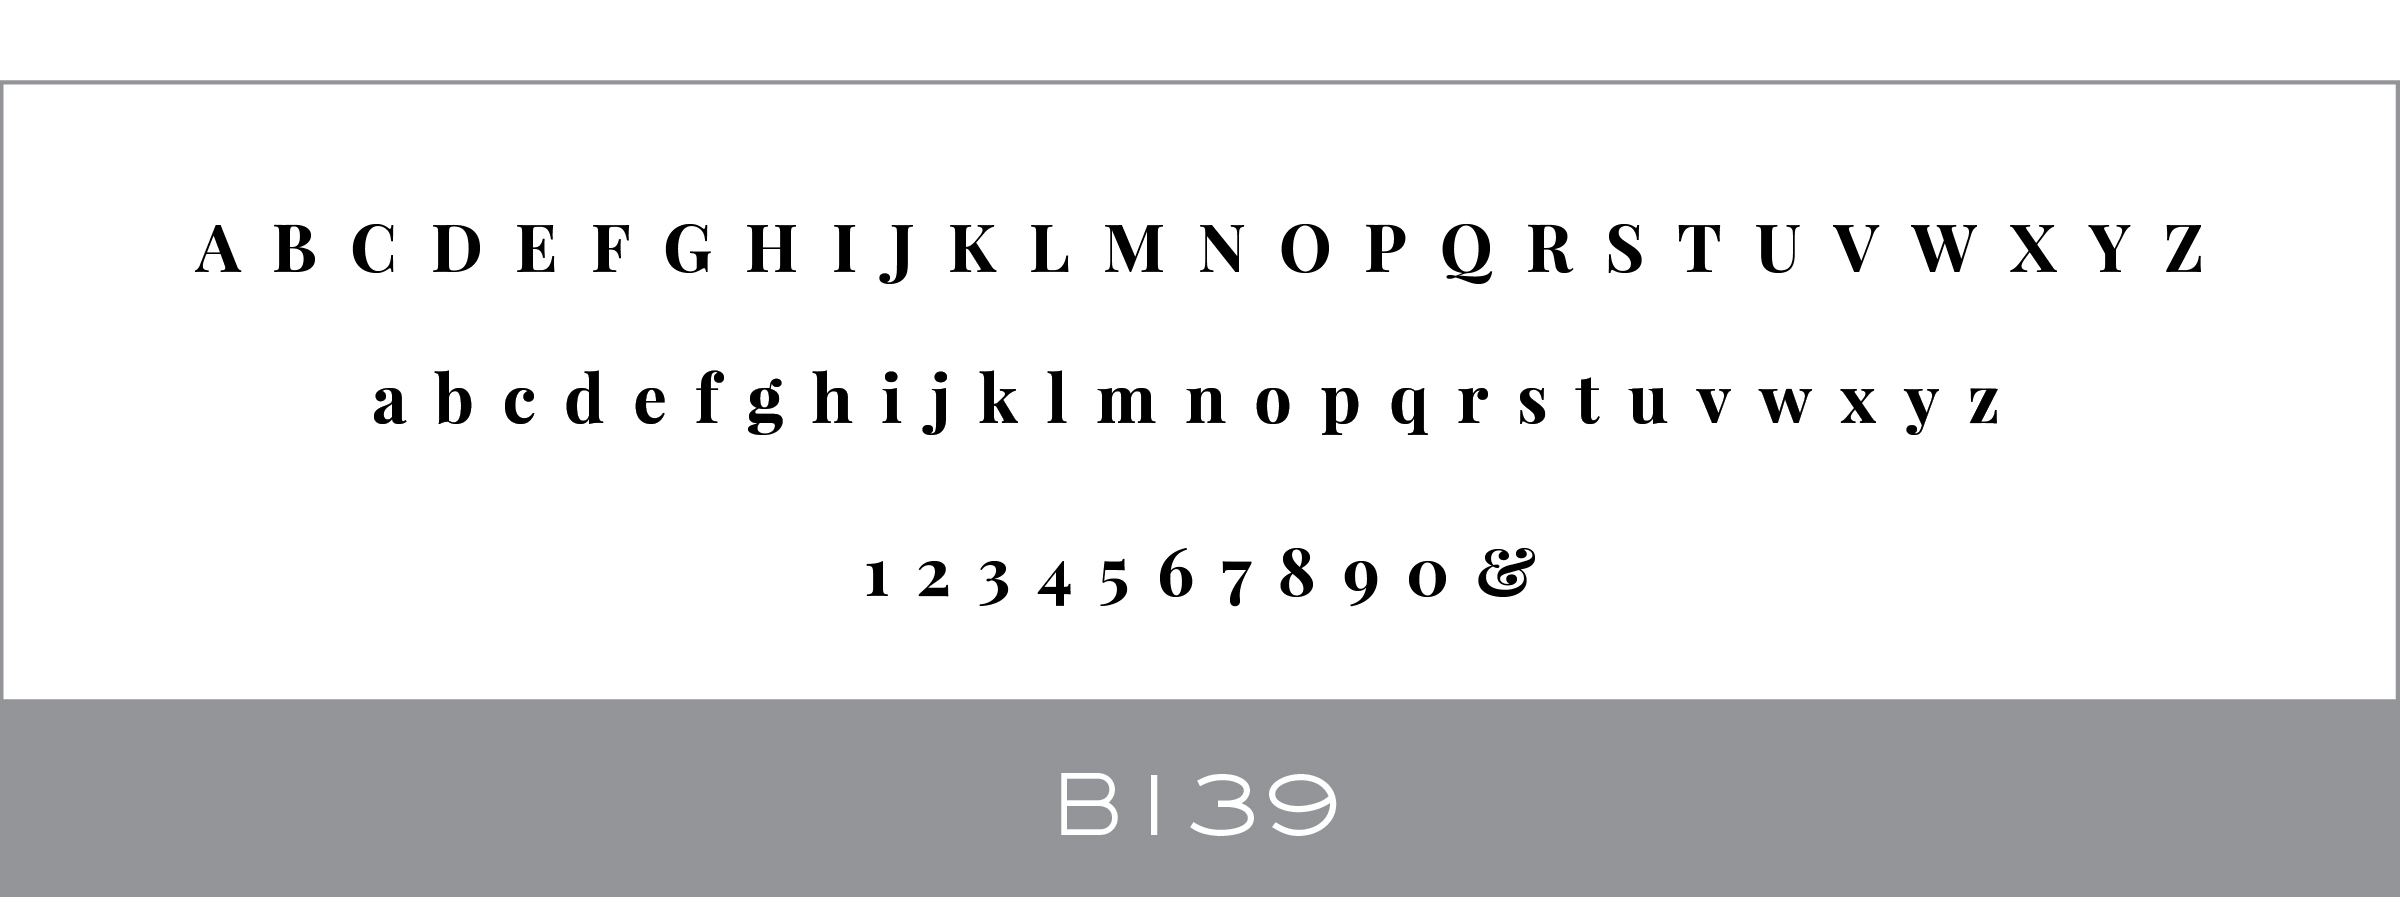 B139_Haute_Papier_Font.jpg